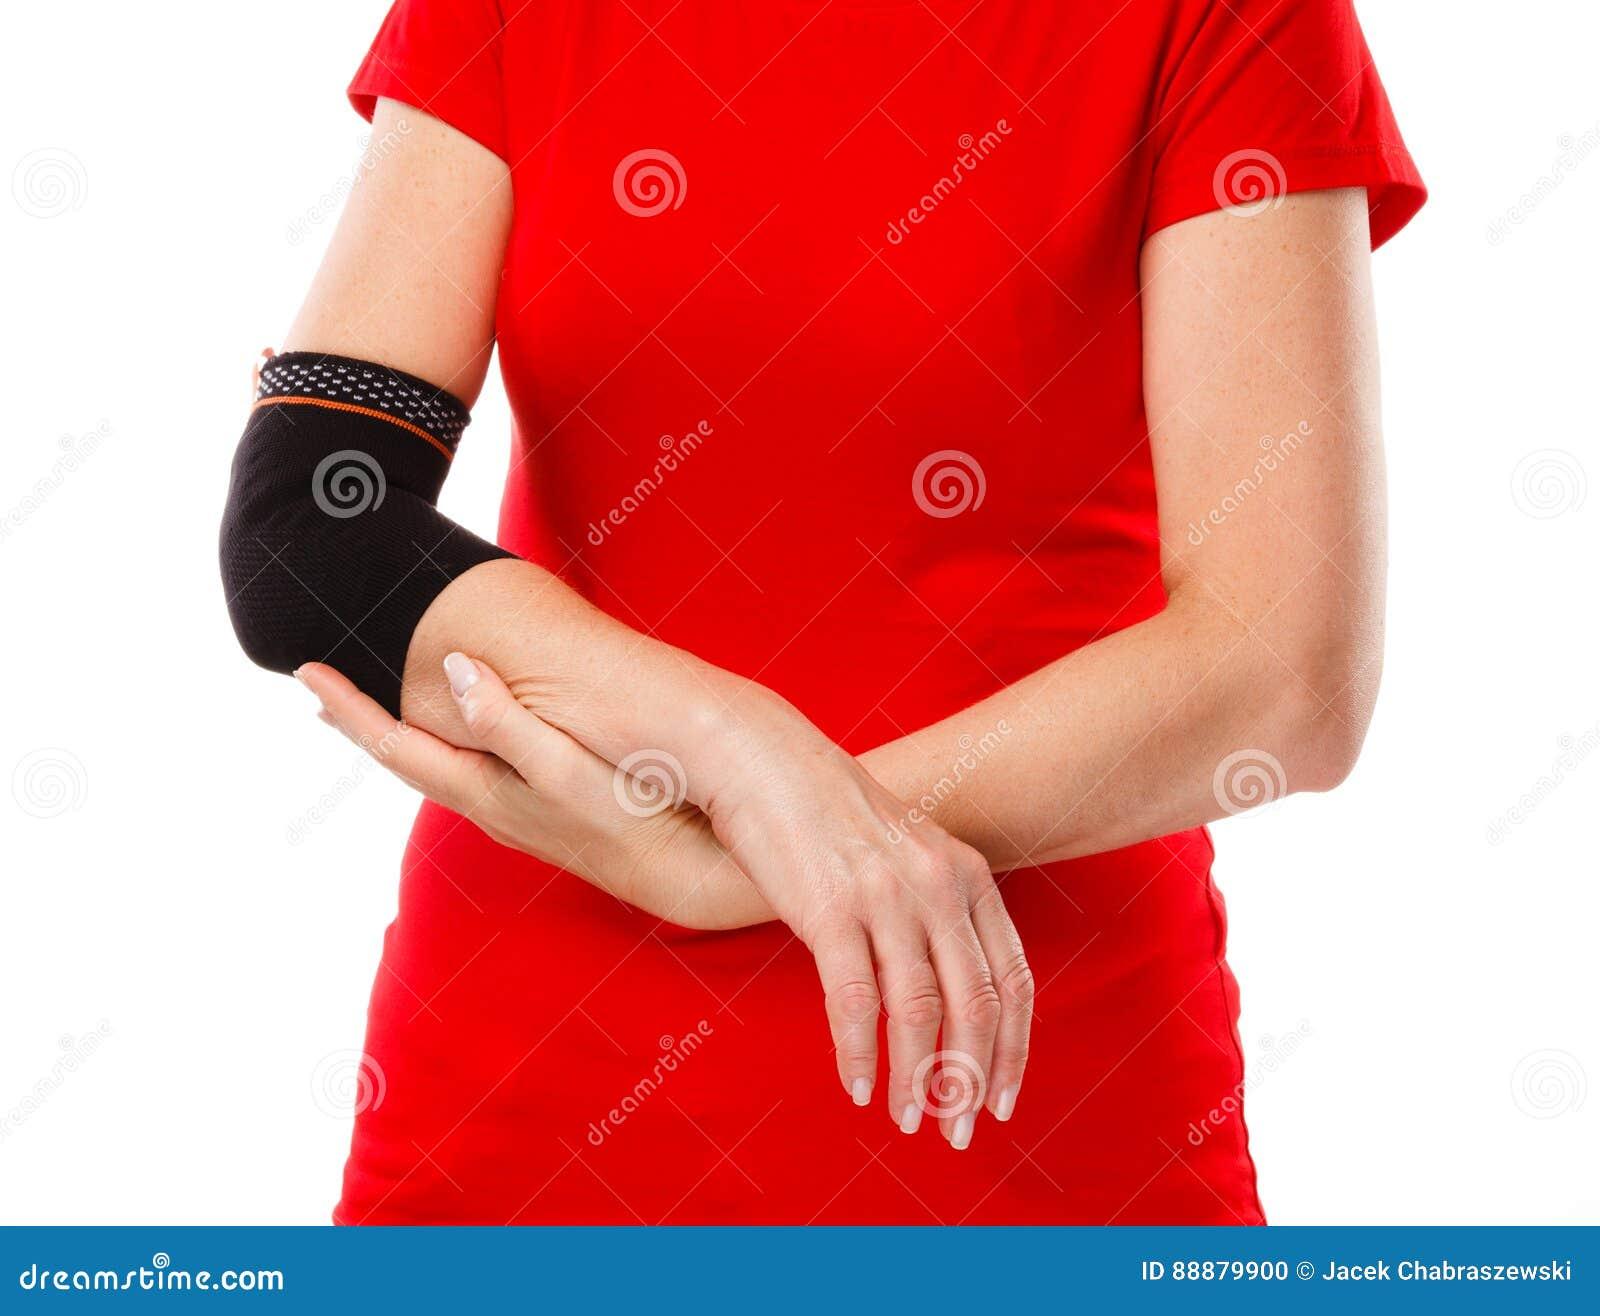 Arm pain stock photo  Image of lifestyle, beautiful, healthcare